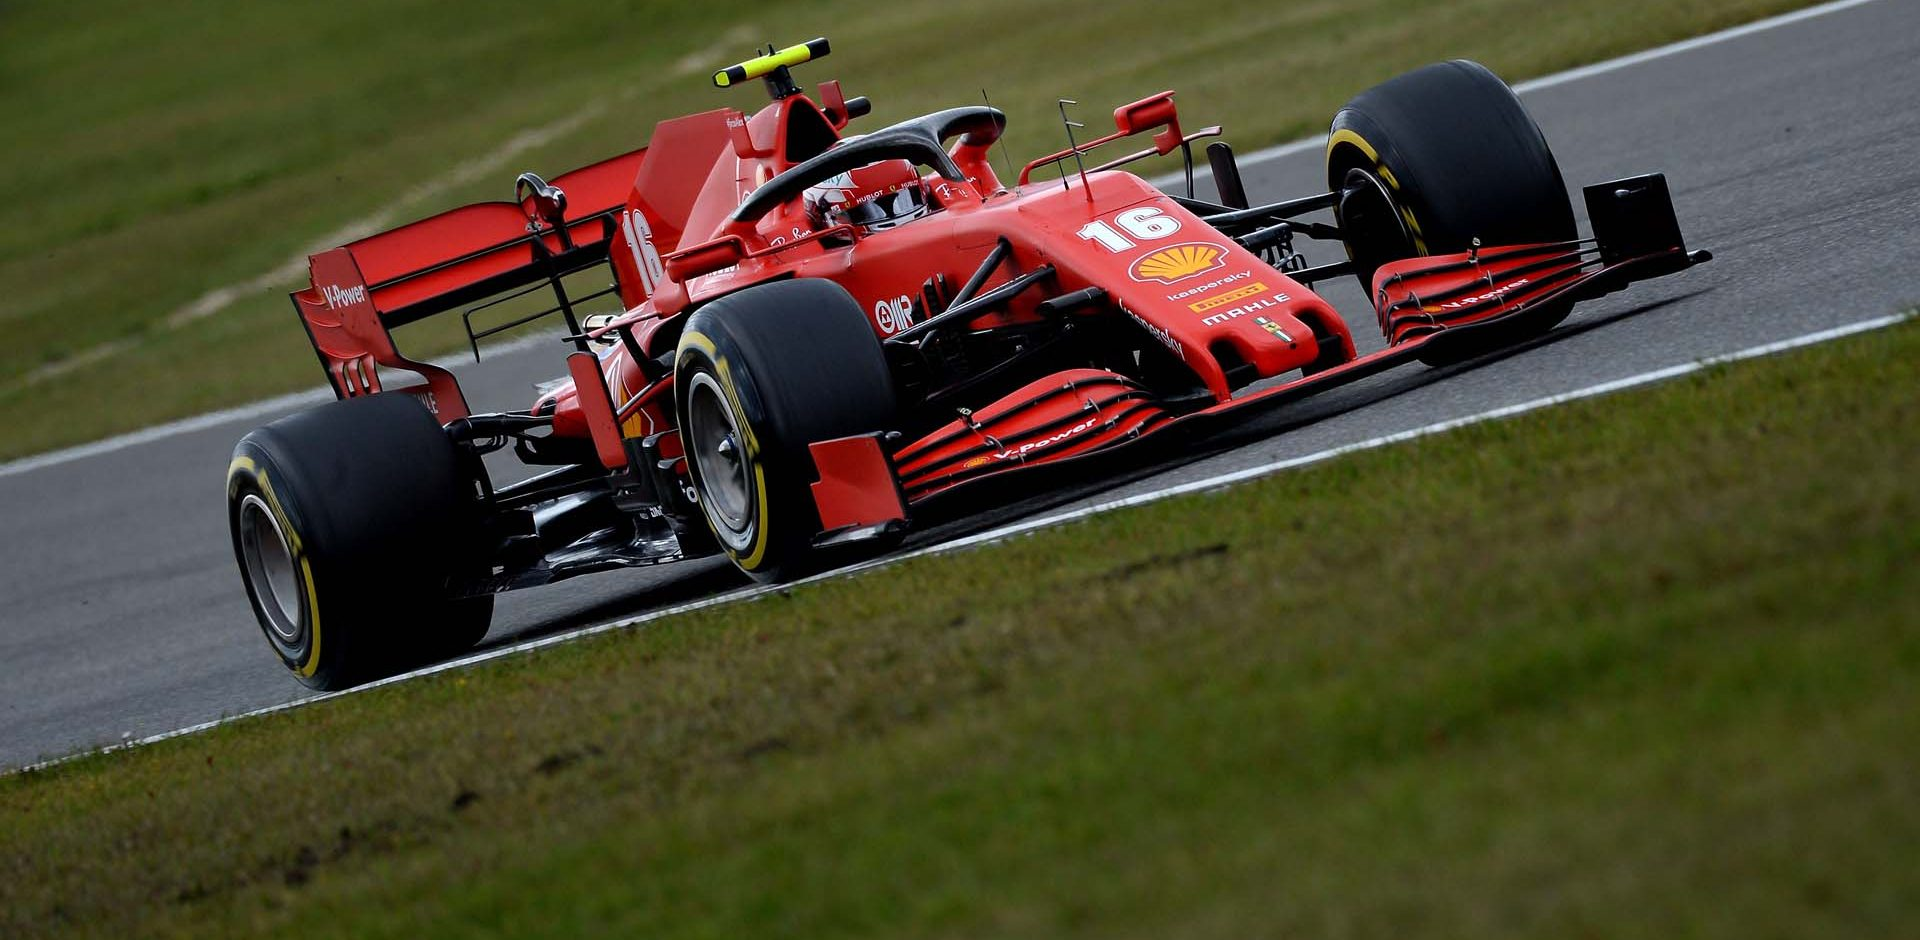 GP GERMANIA F1/2020 -  DOMENICA 11/10/2020   credit: @Scuderia Ferrari Press Office Charles Leclerc